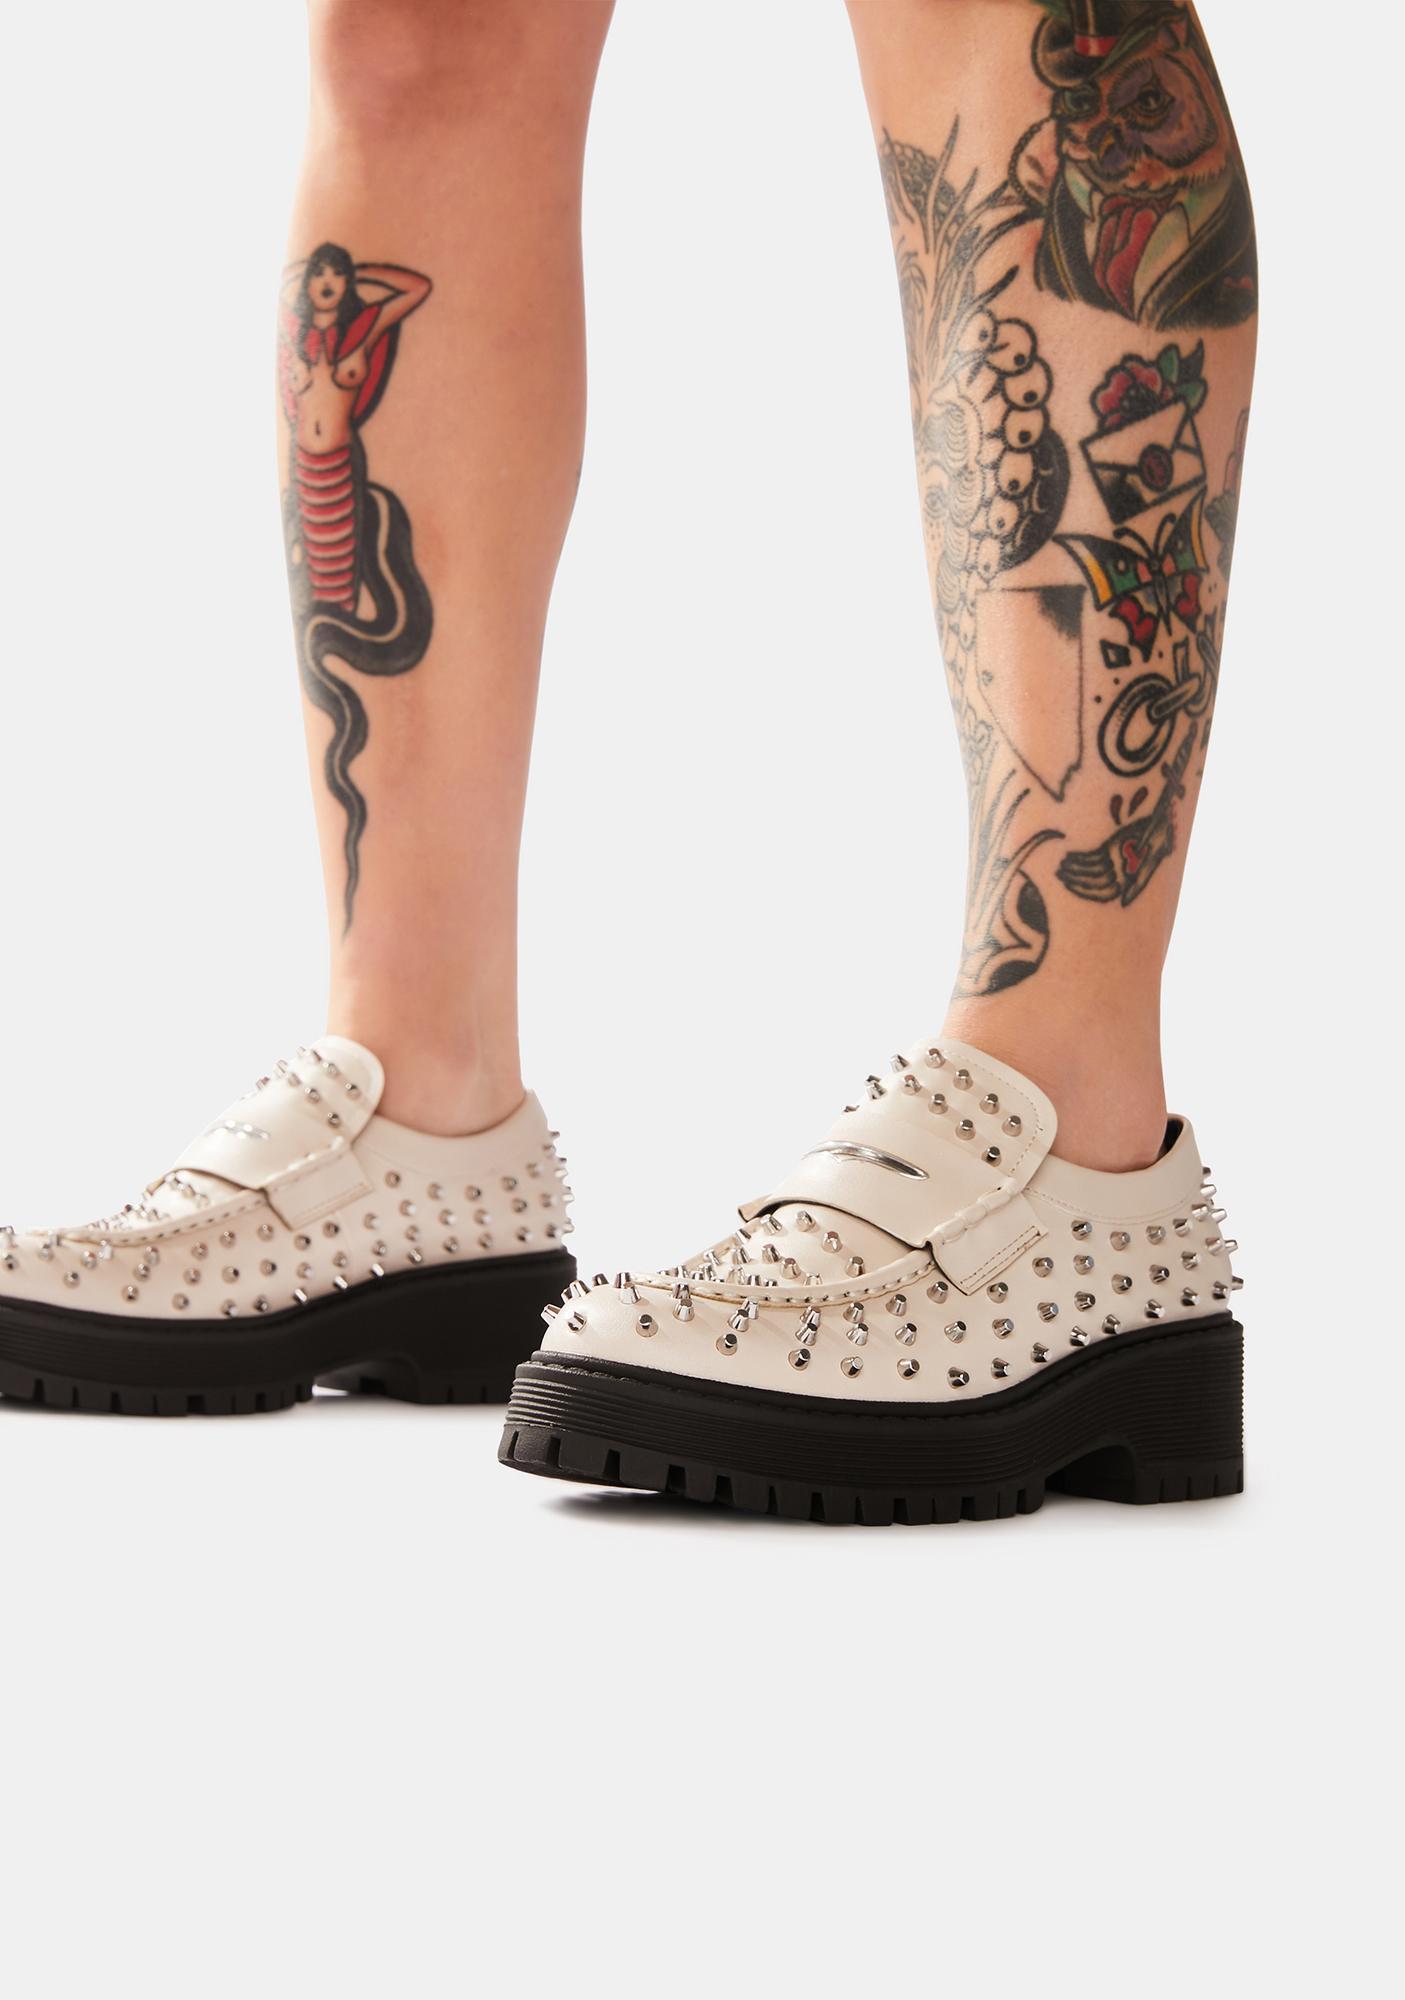 Steve Madden Bone Malvern Studded Loafers